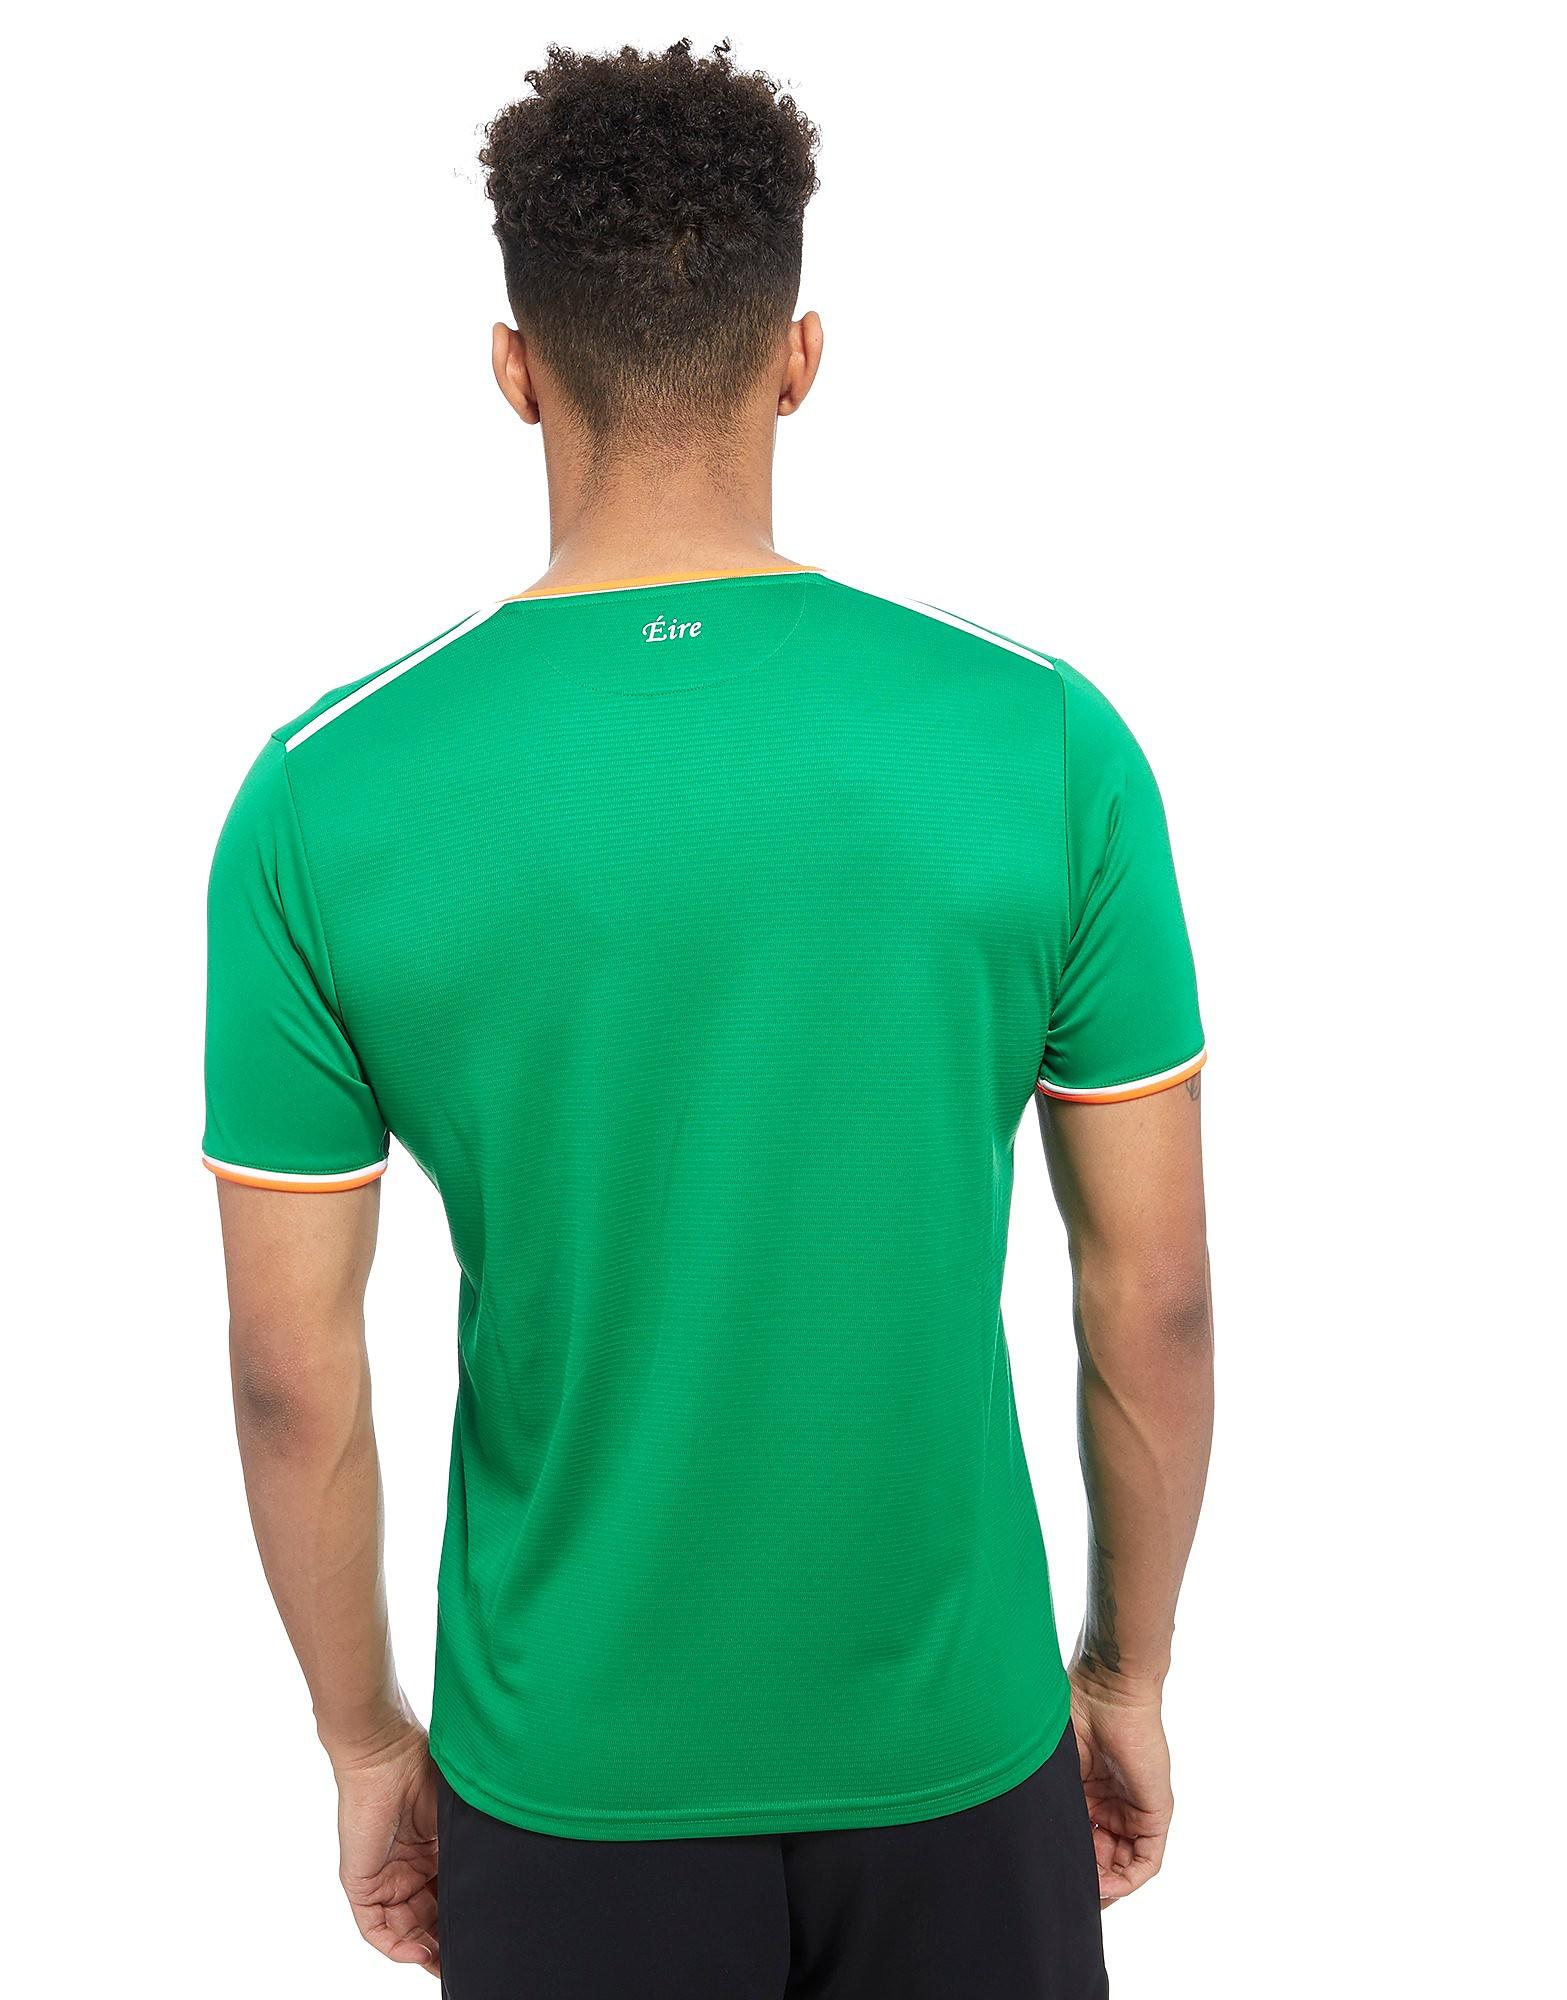 New Balance Republic of Ireland 2017/18 Home Shirt